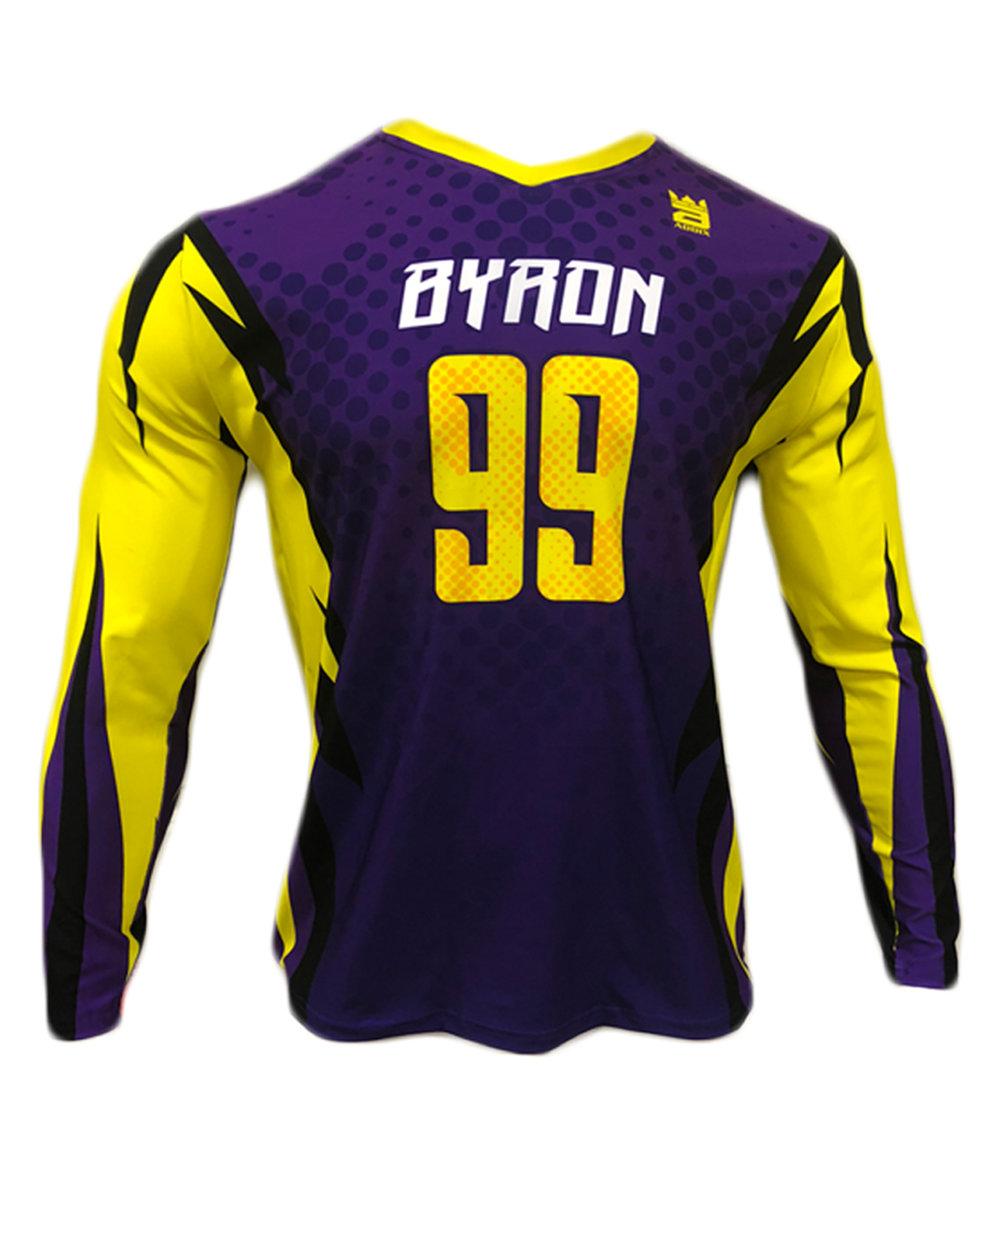 Byron Custom Soccer Jersey.jpg